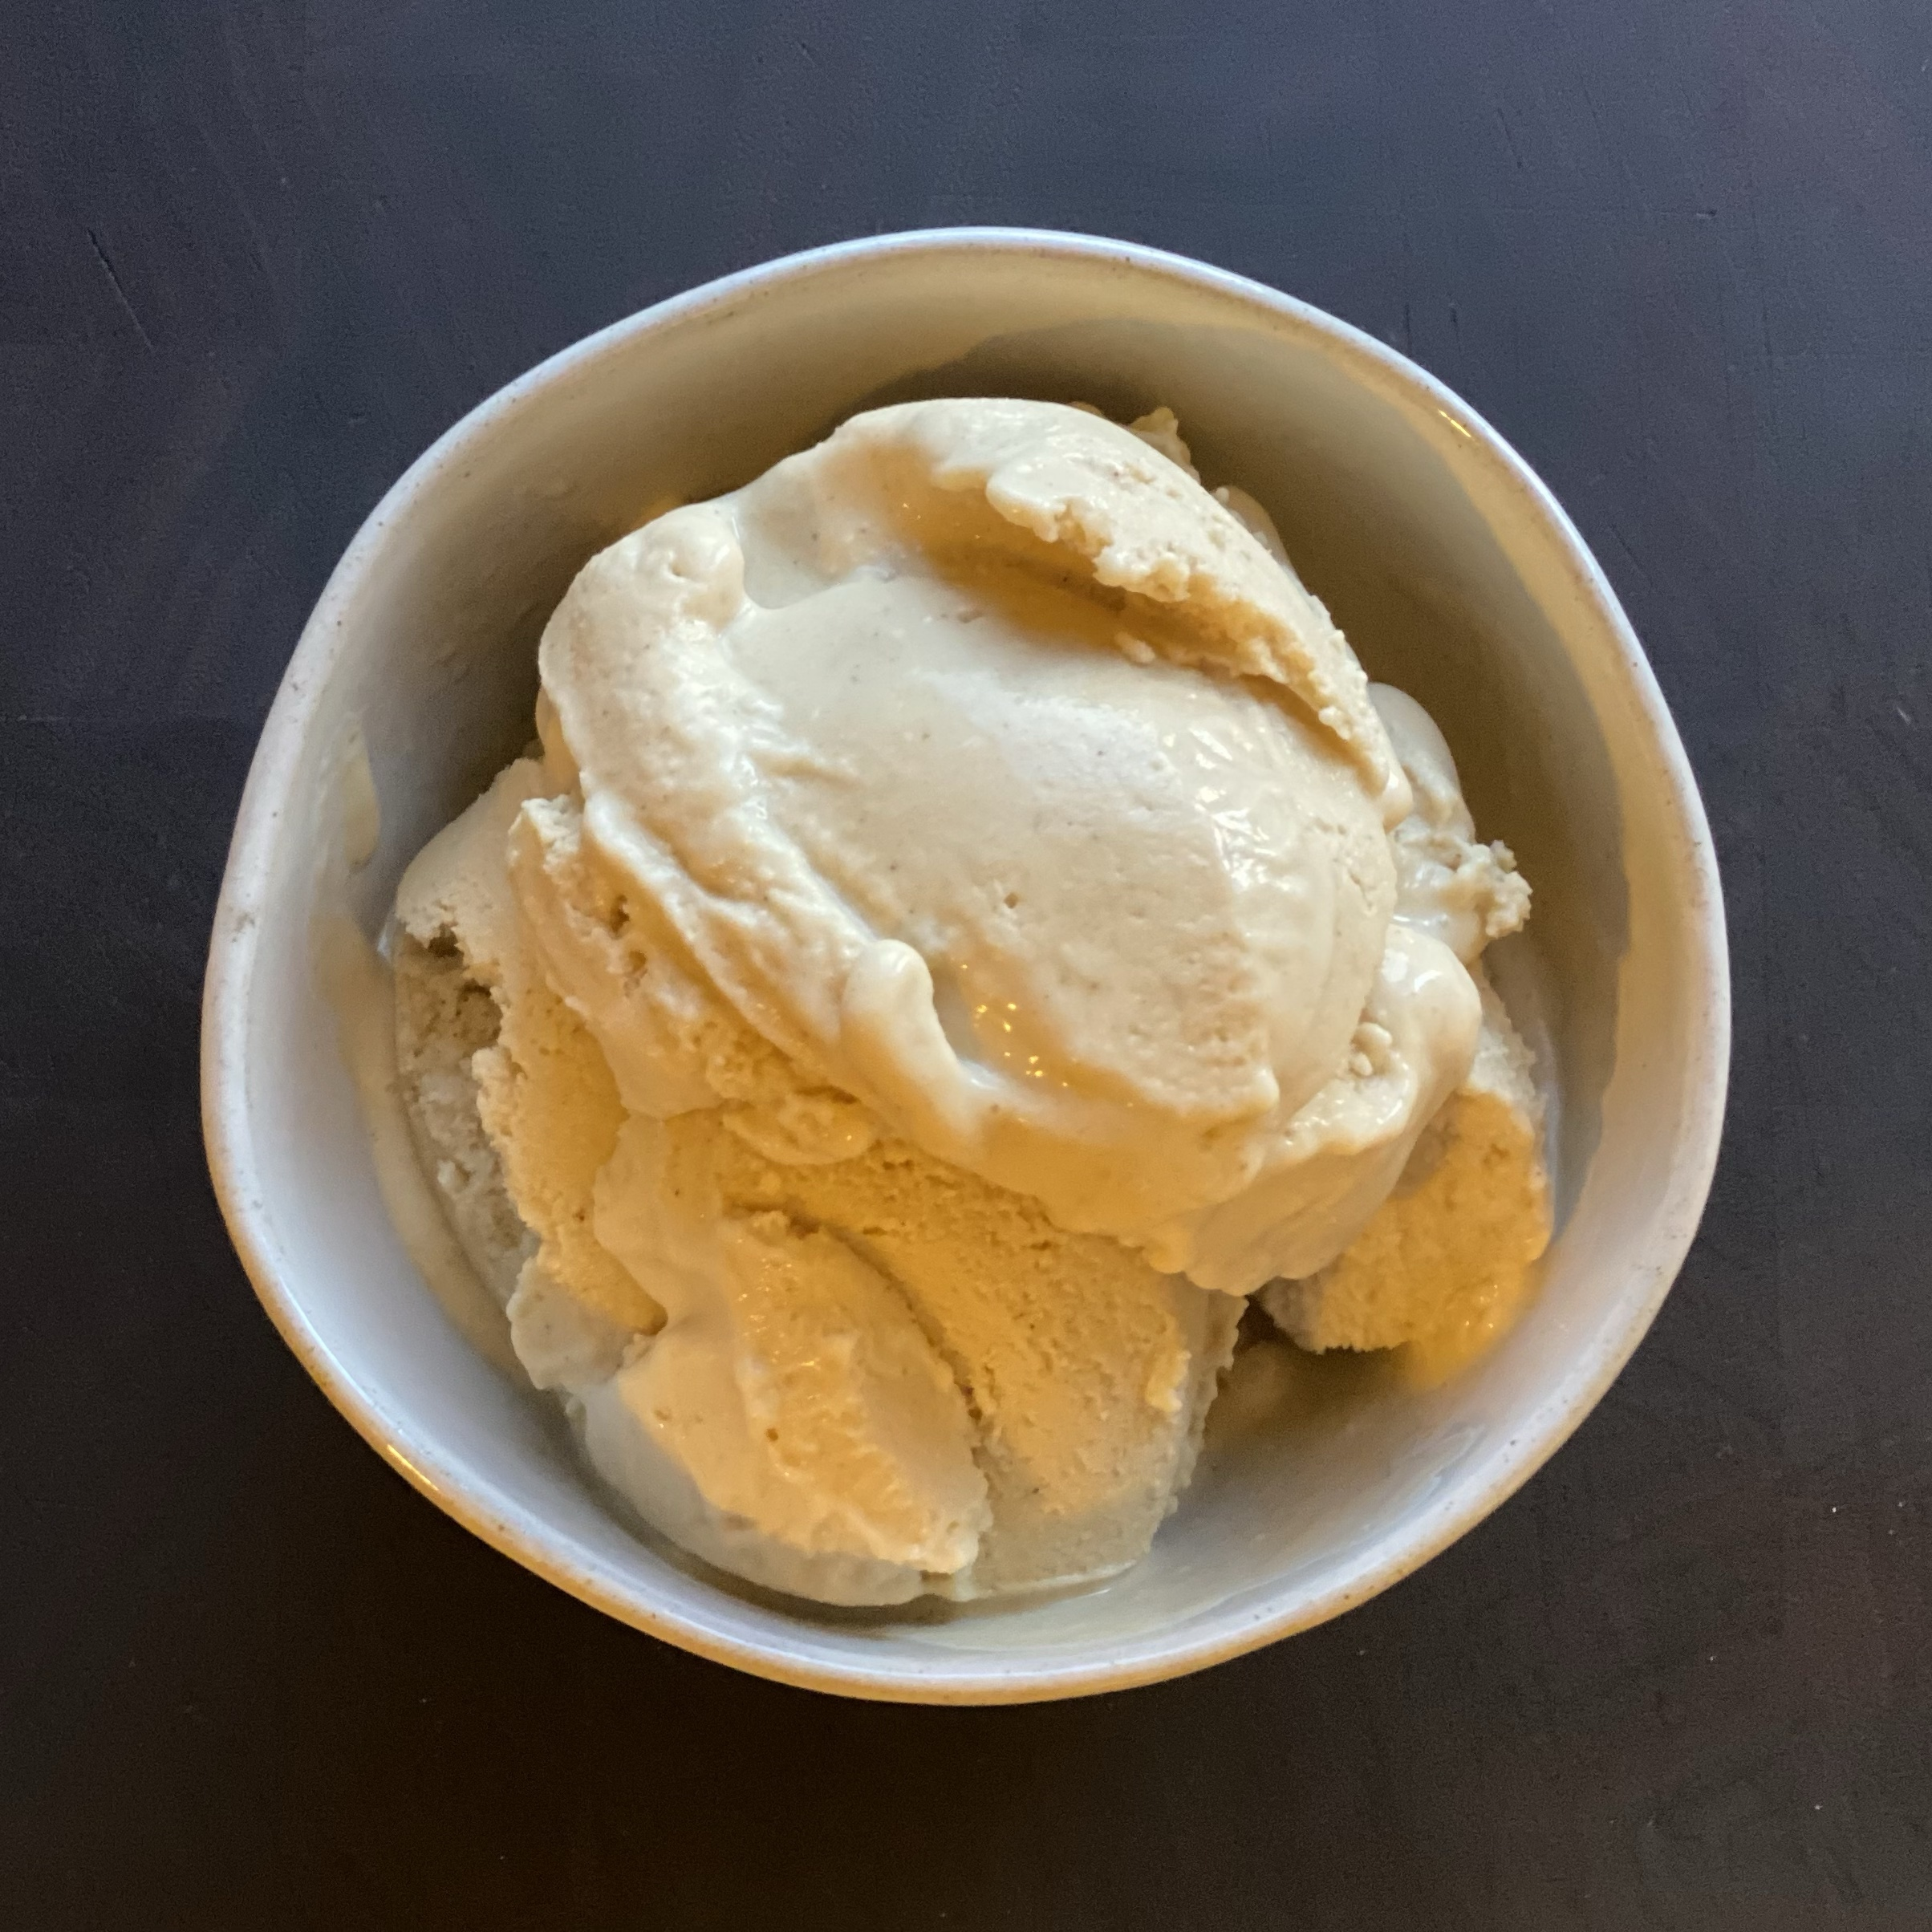 Nootropic Chai Ice Cream (Keto & Paleo)